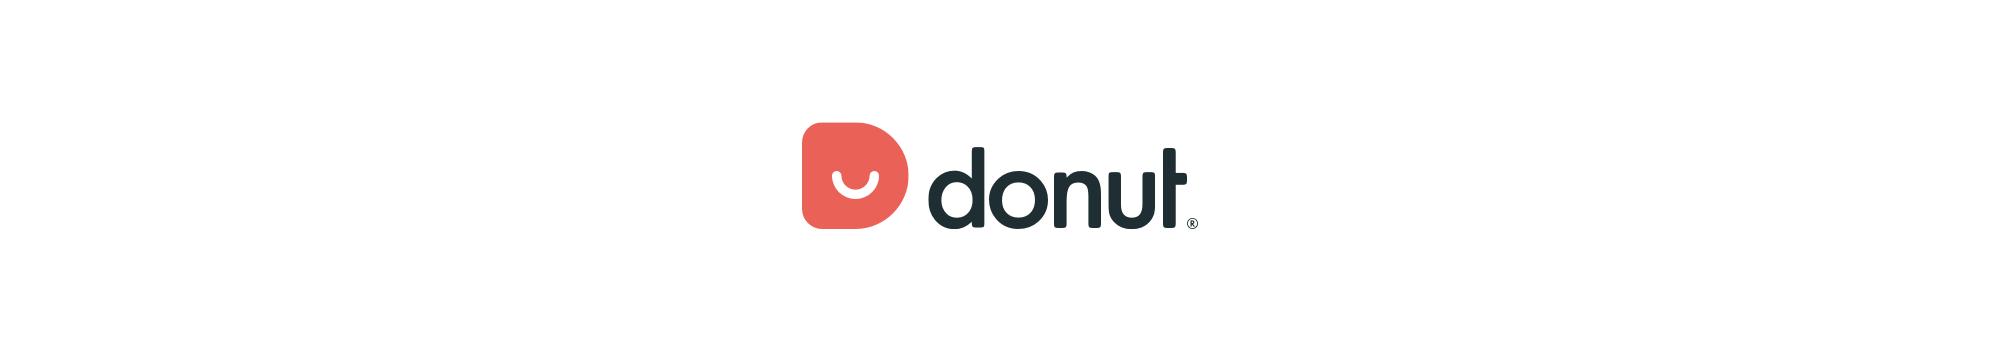 DonutLogo